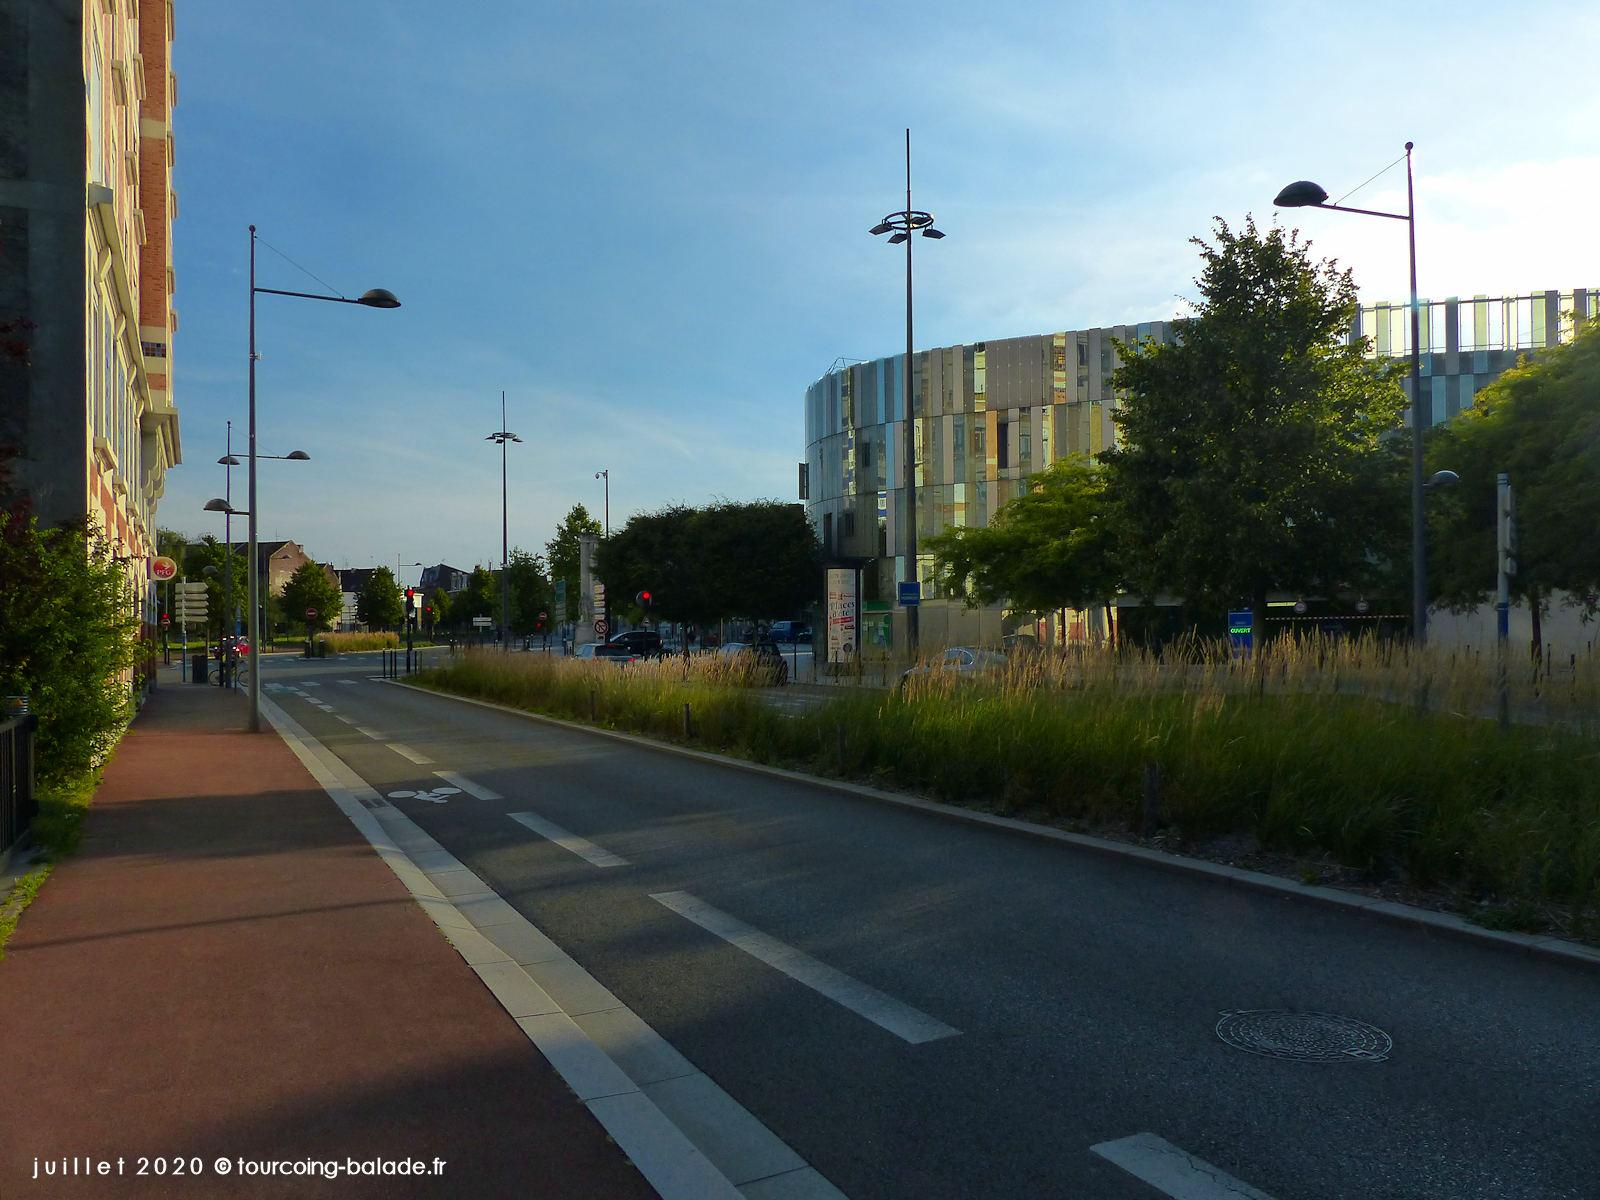 Rue d'Havré, Tourcoing 2020